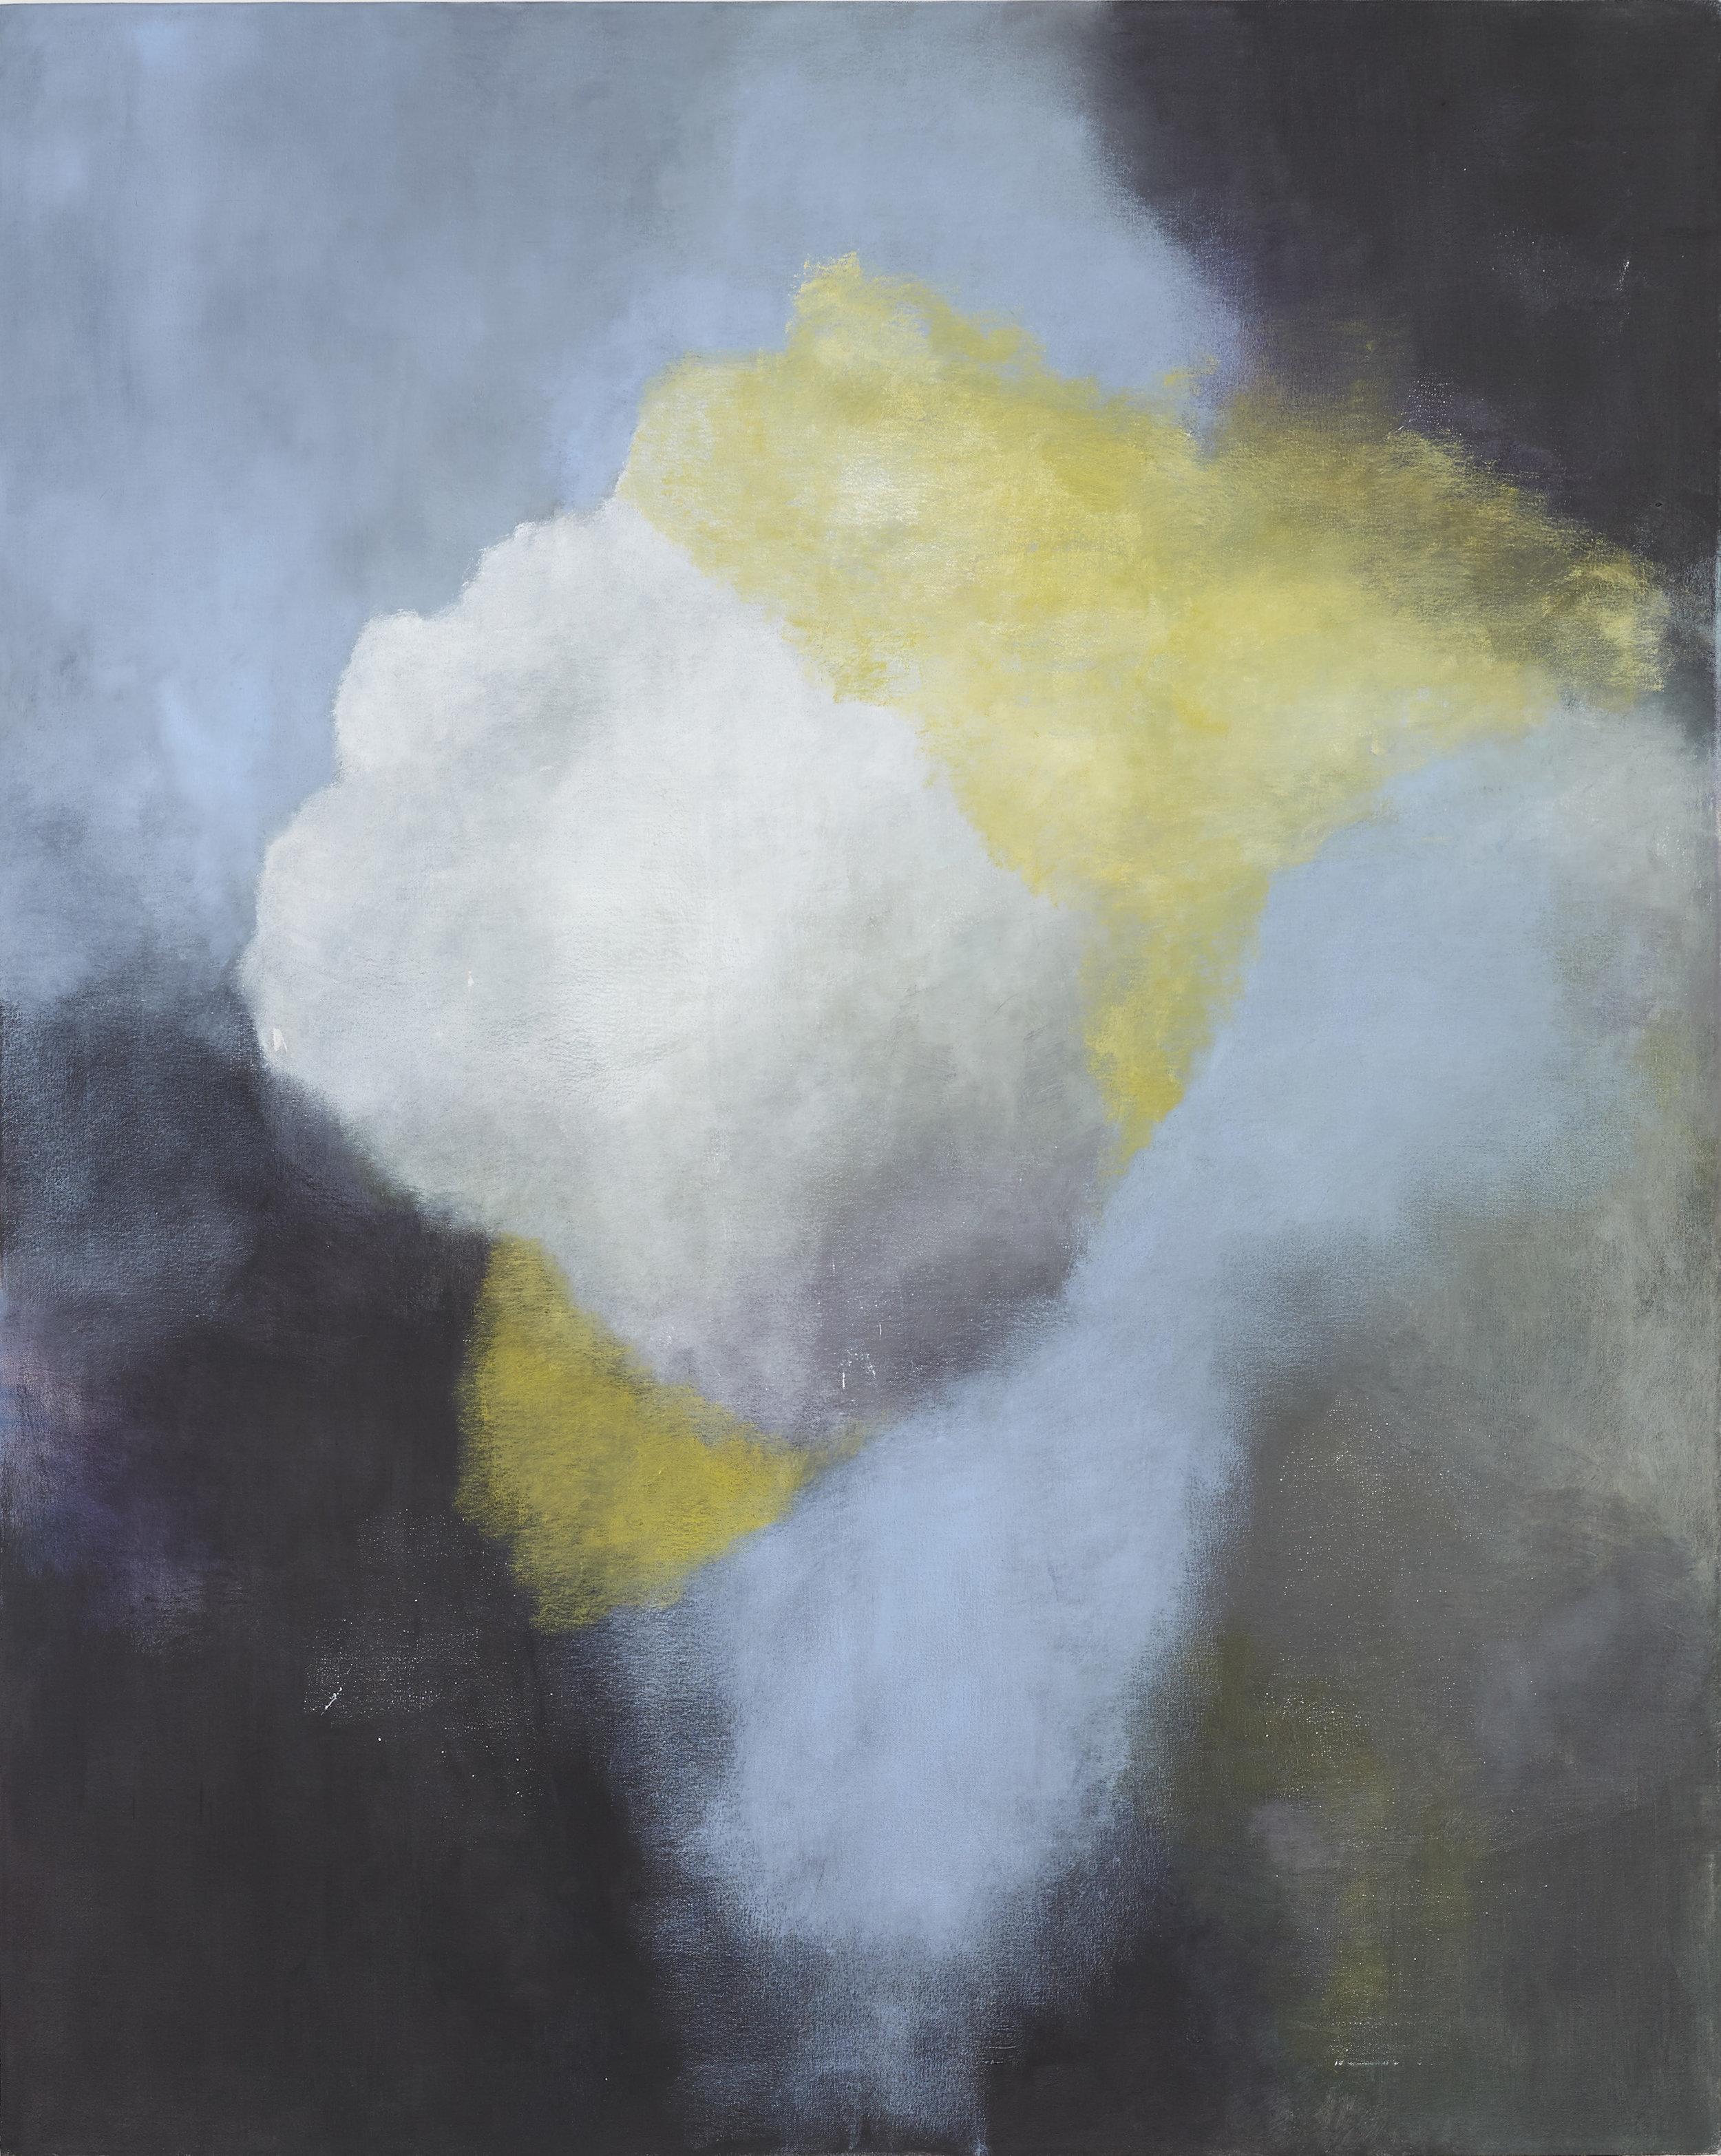 """Fungolo I"" 40""x50"" Oil on Canvas, 2016"